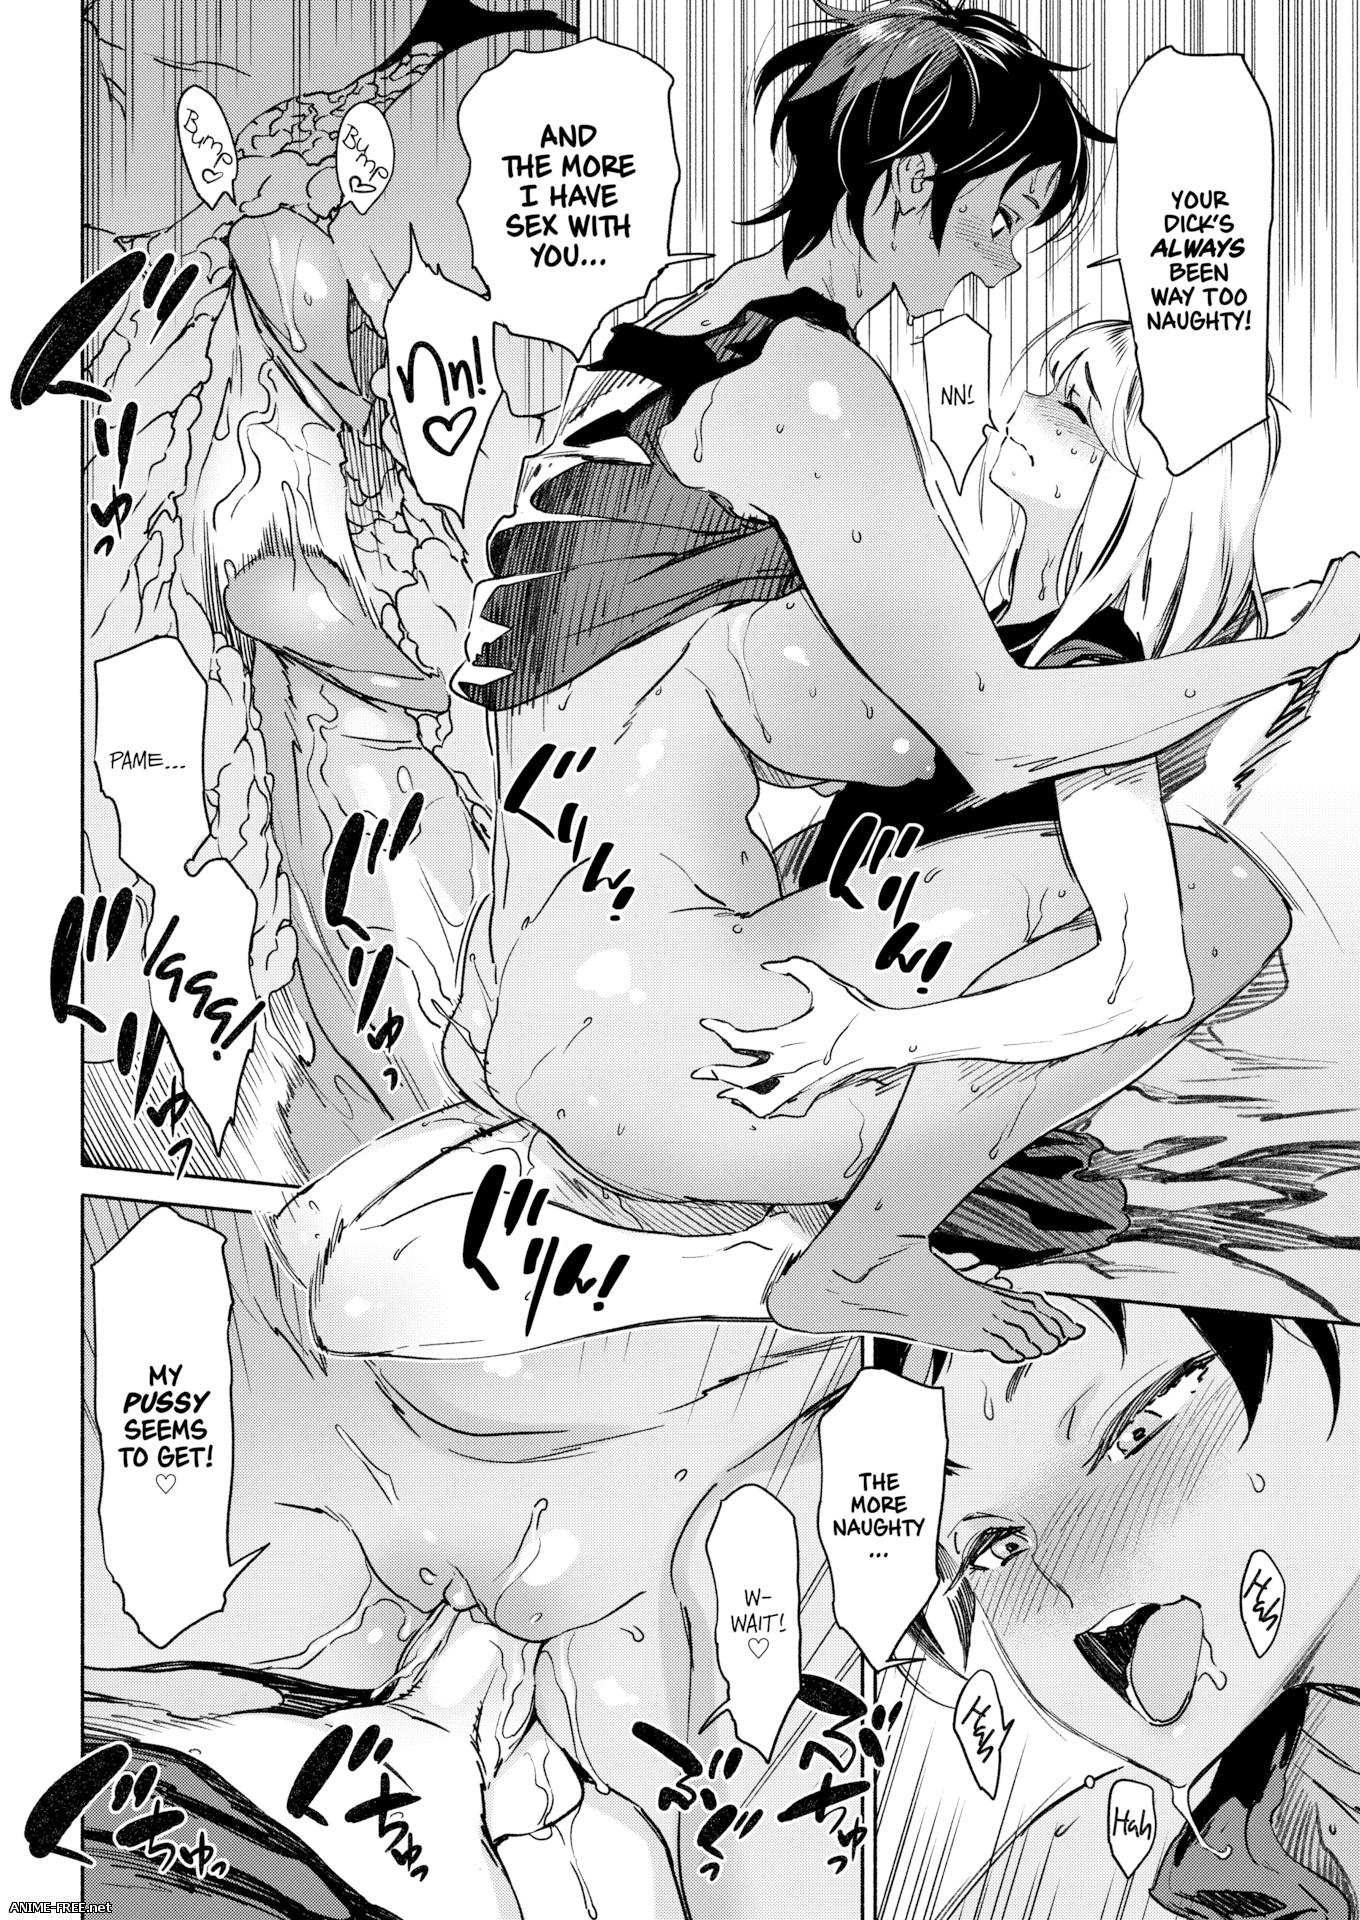 Fakku (Collection 3) - Сборник хентай манги (Часть - 3) [Uncen] [ENG] Manga Hentai